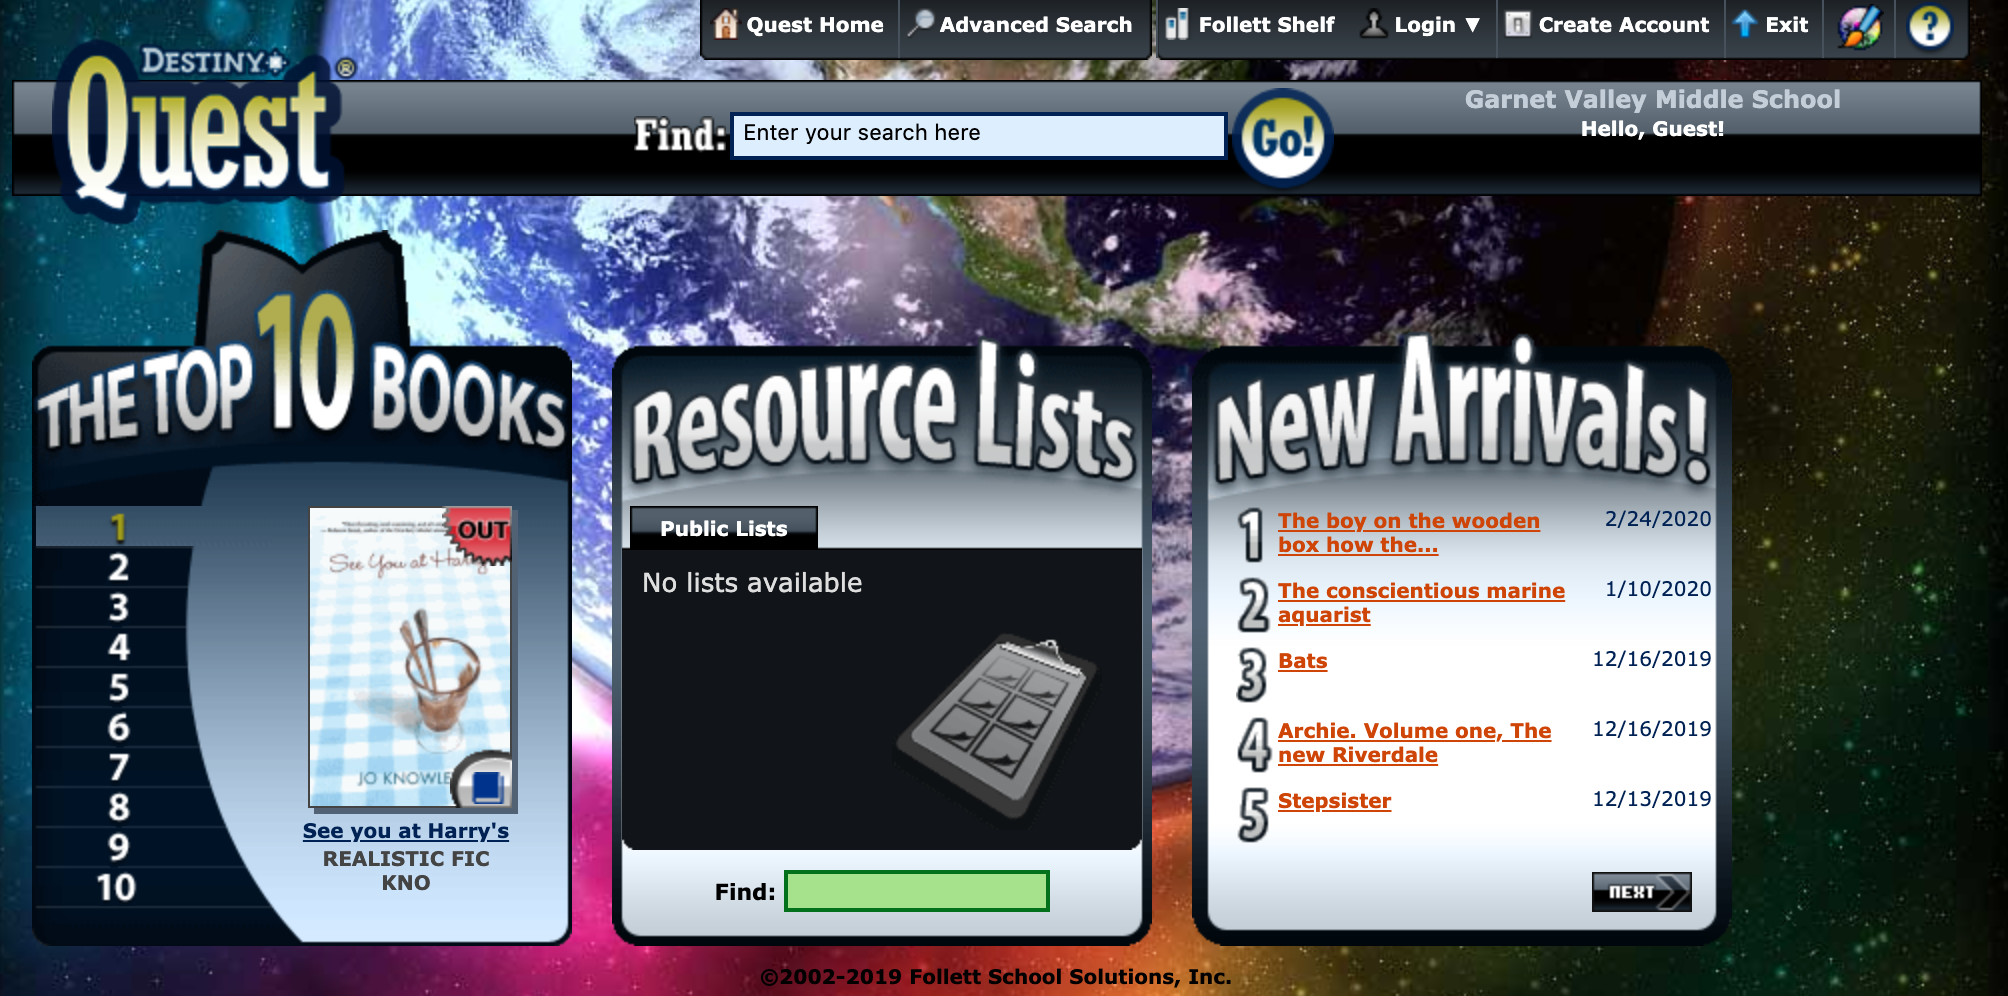 Destiny Quest homepage #